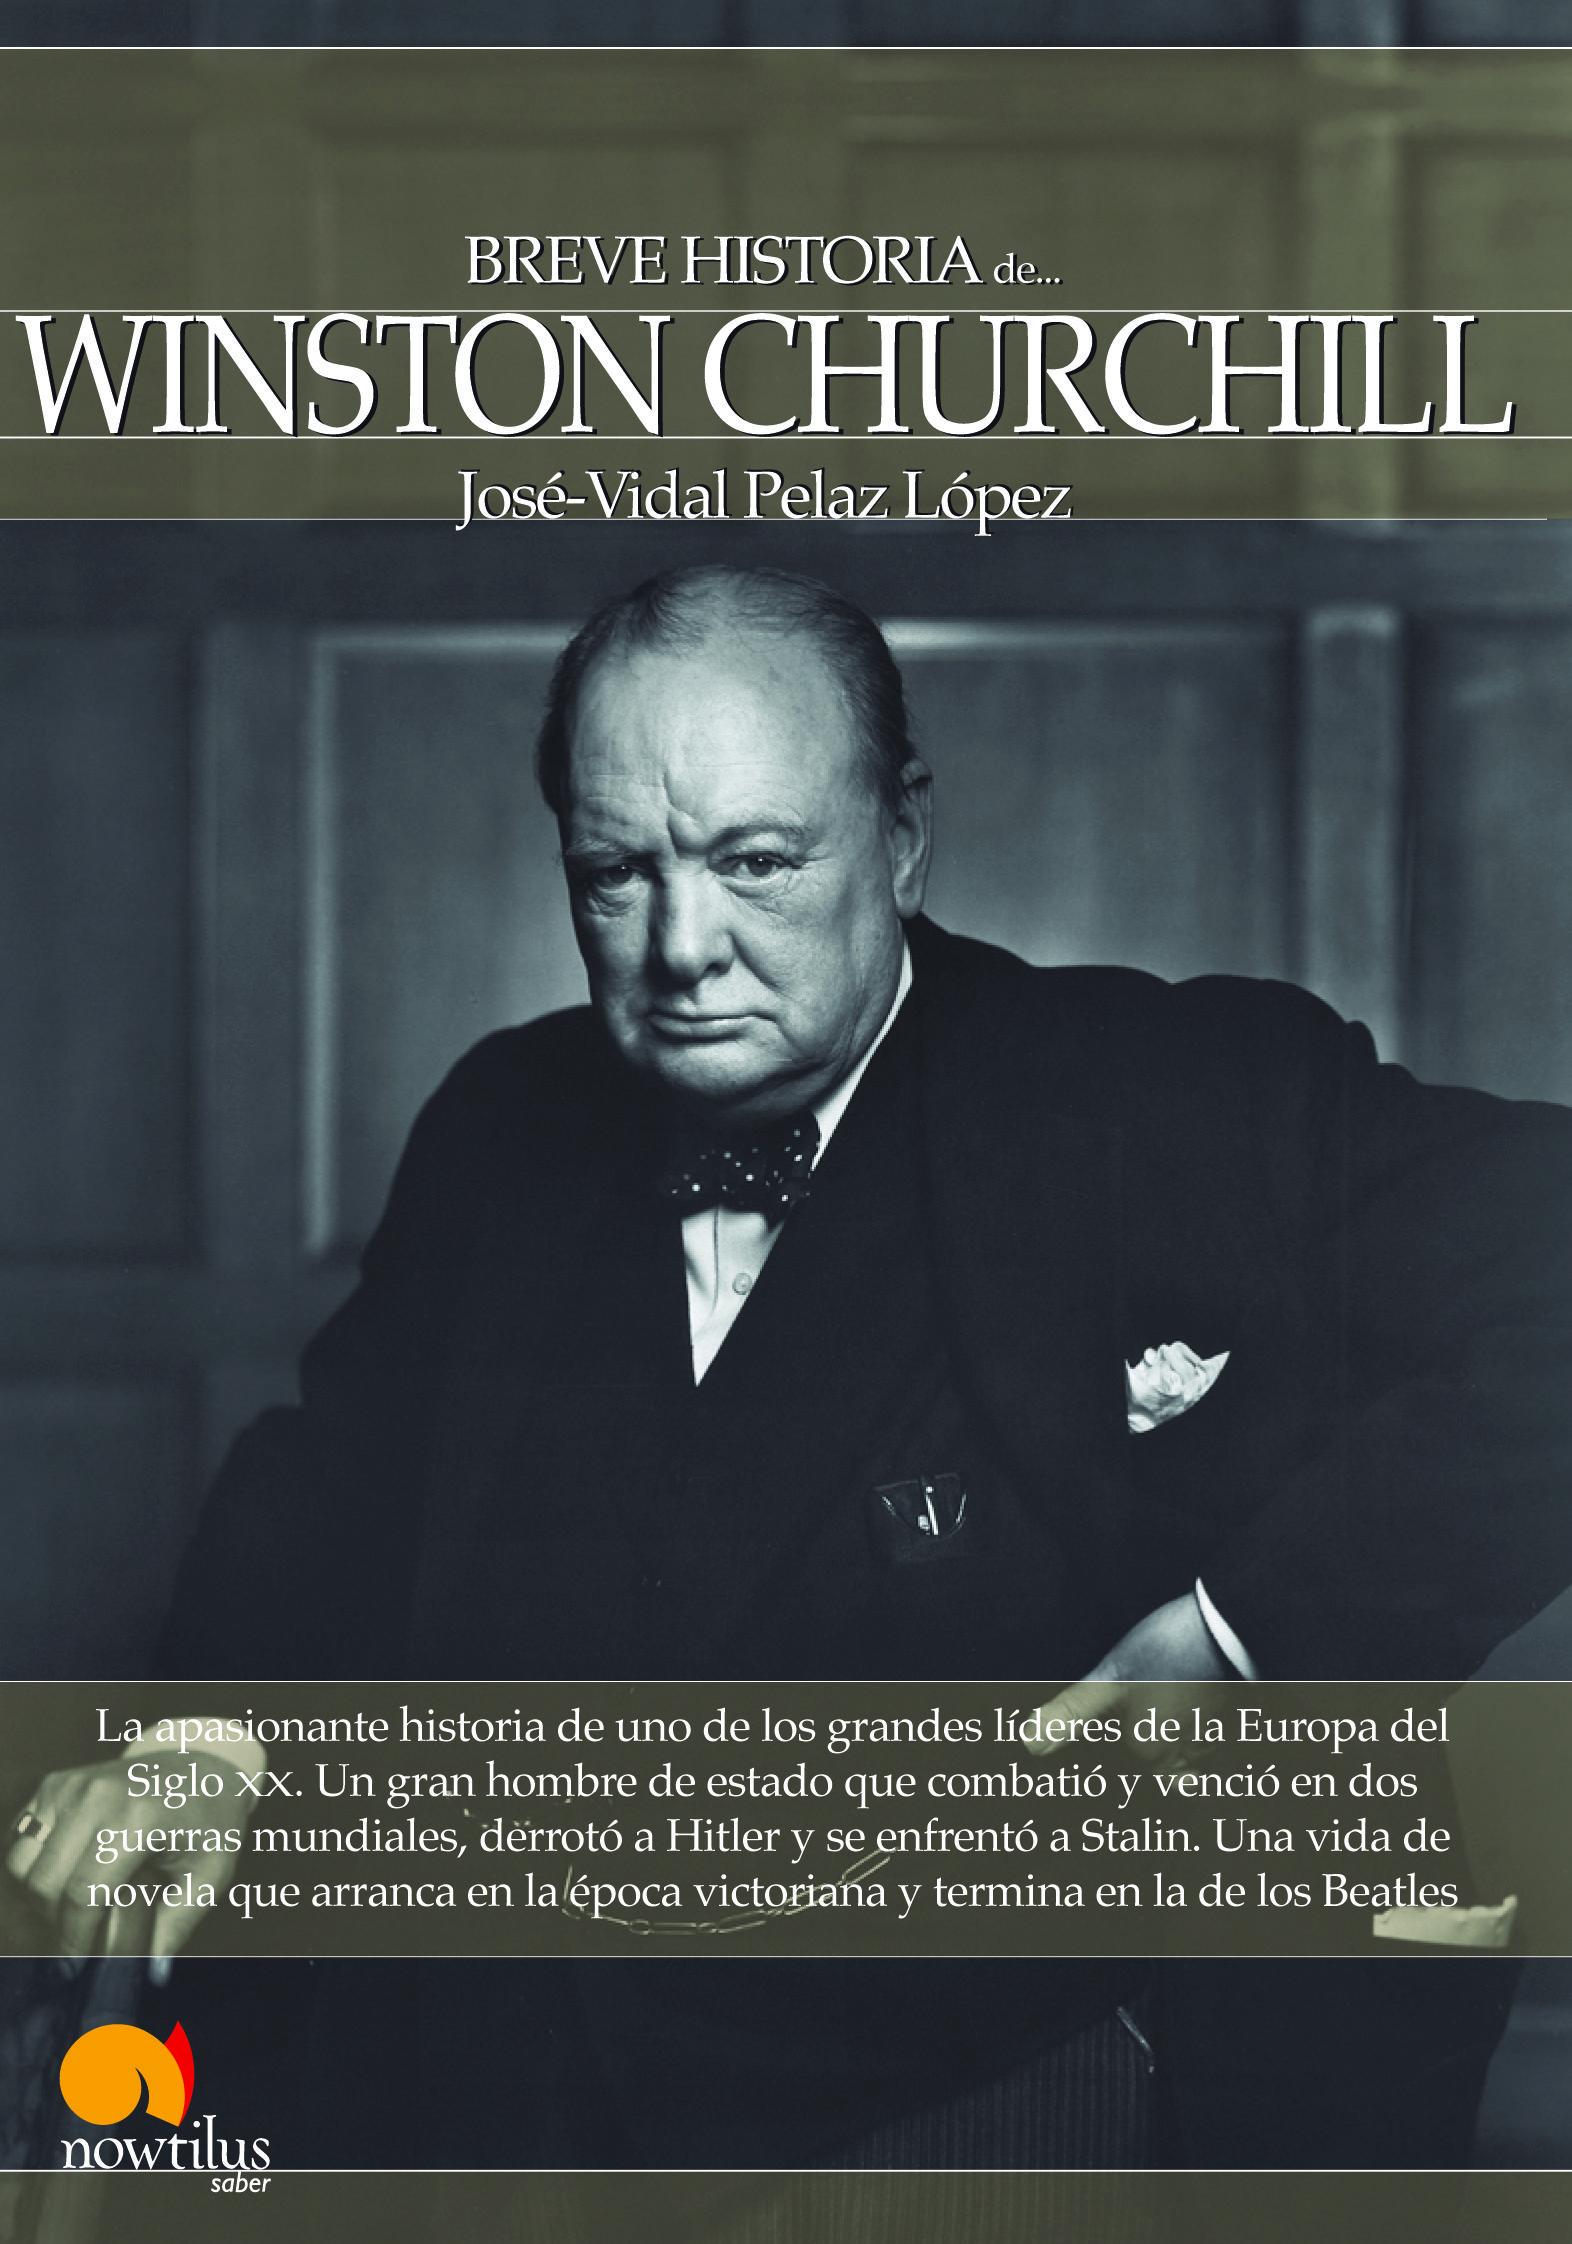 breve historia de winston churchill-jose-vidal pelaz lopez-9788499674209